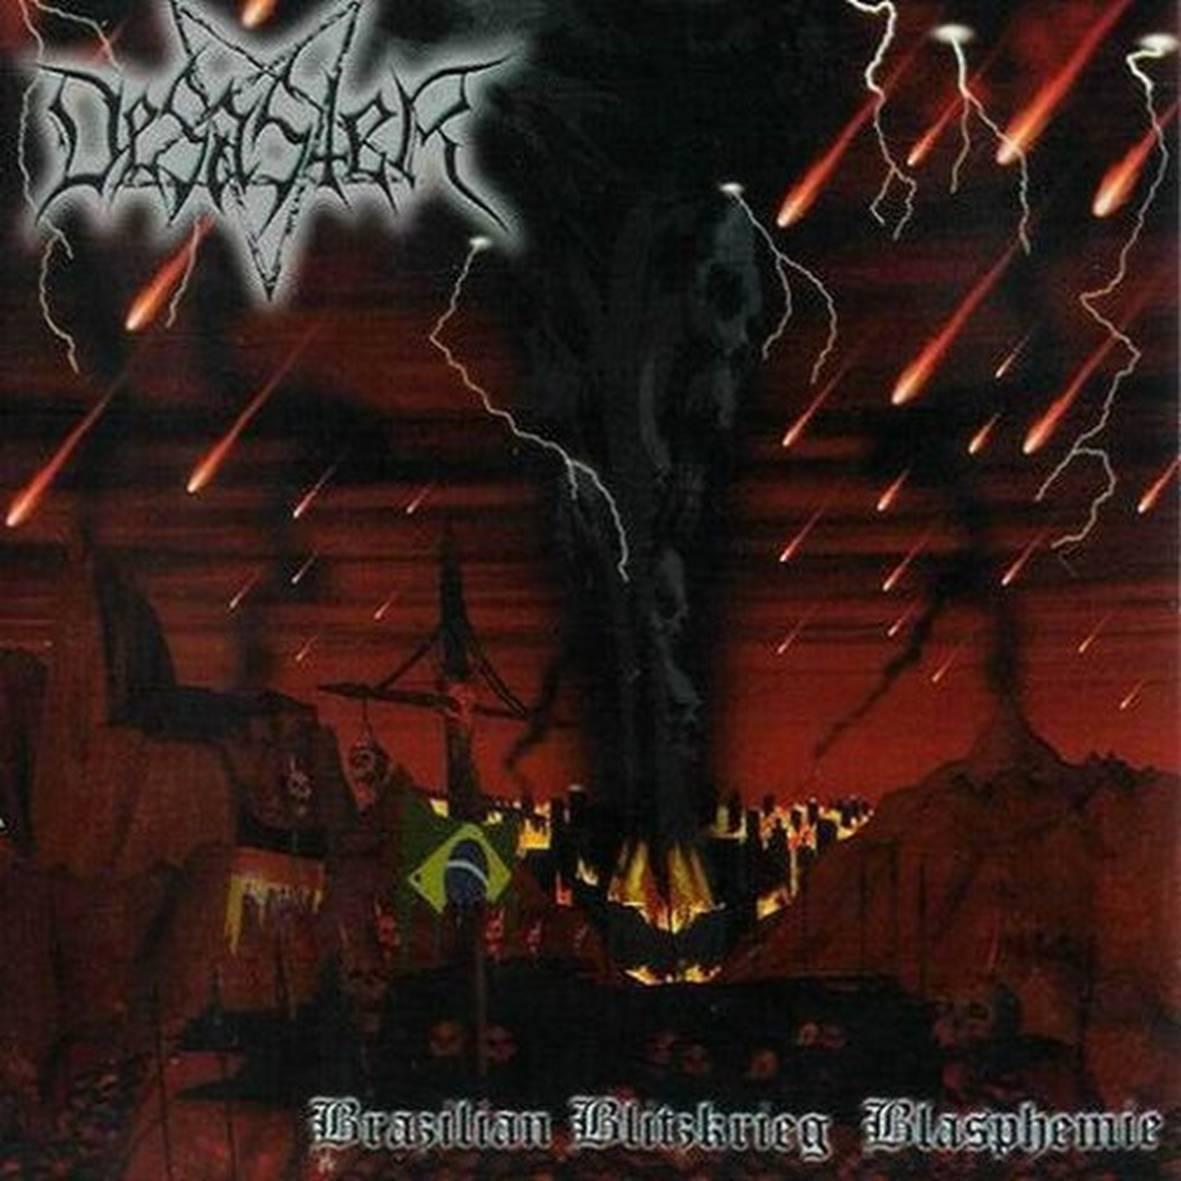 CD Desaster - Brazilian Blitzkrieg Blasphemies